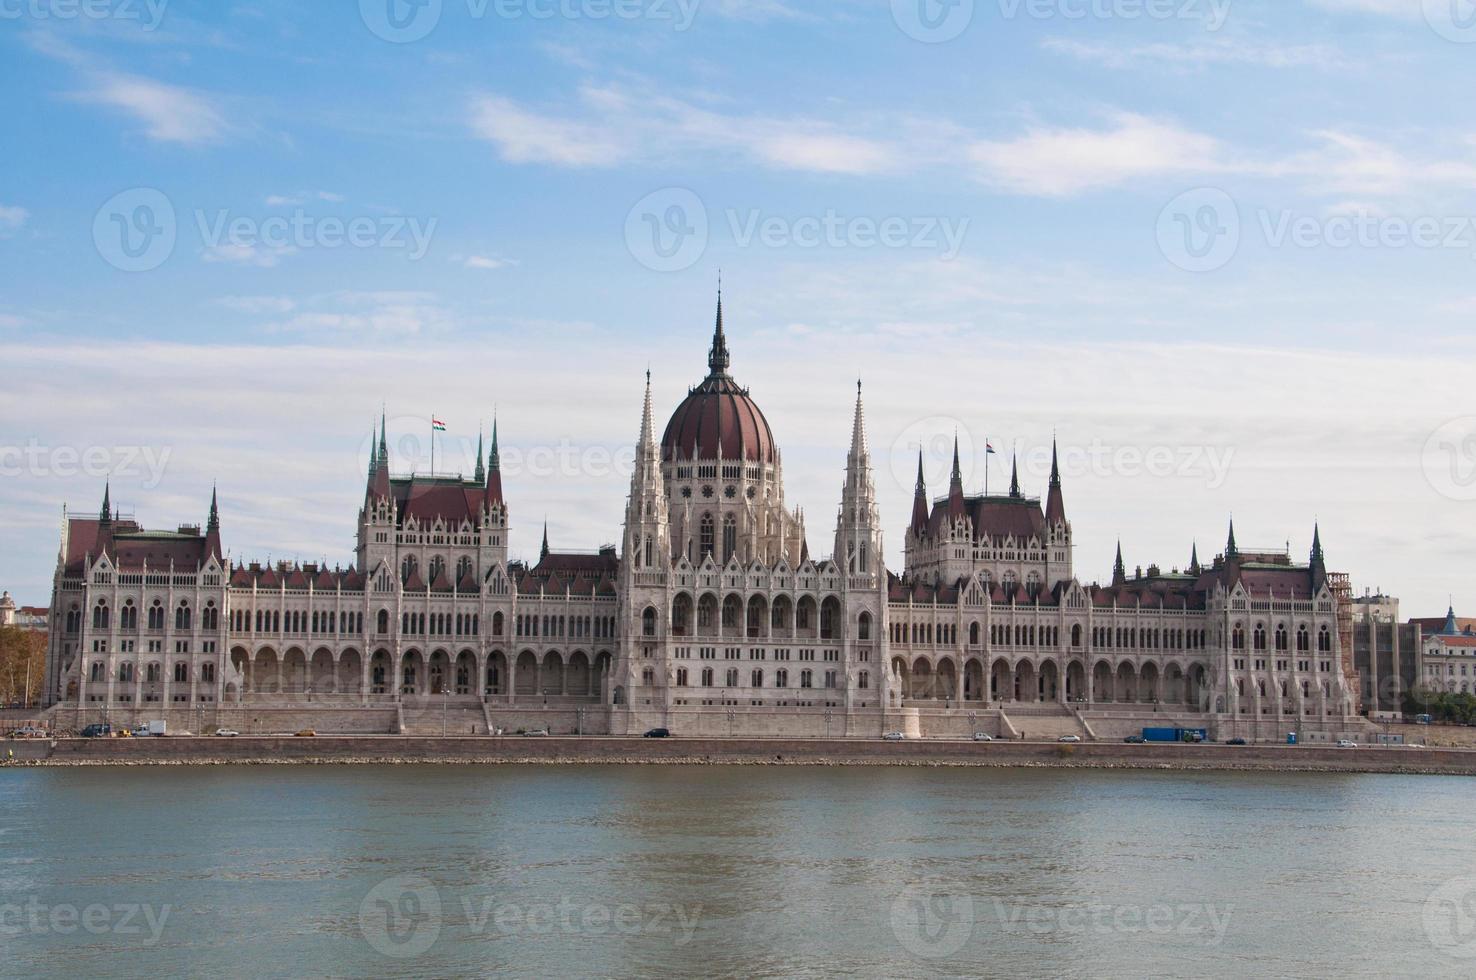 parlamentets byggnad i Budapest, Ungern foto